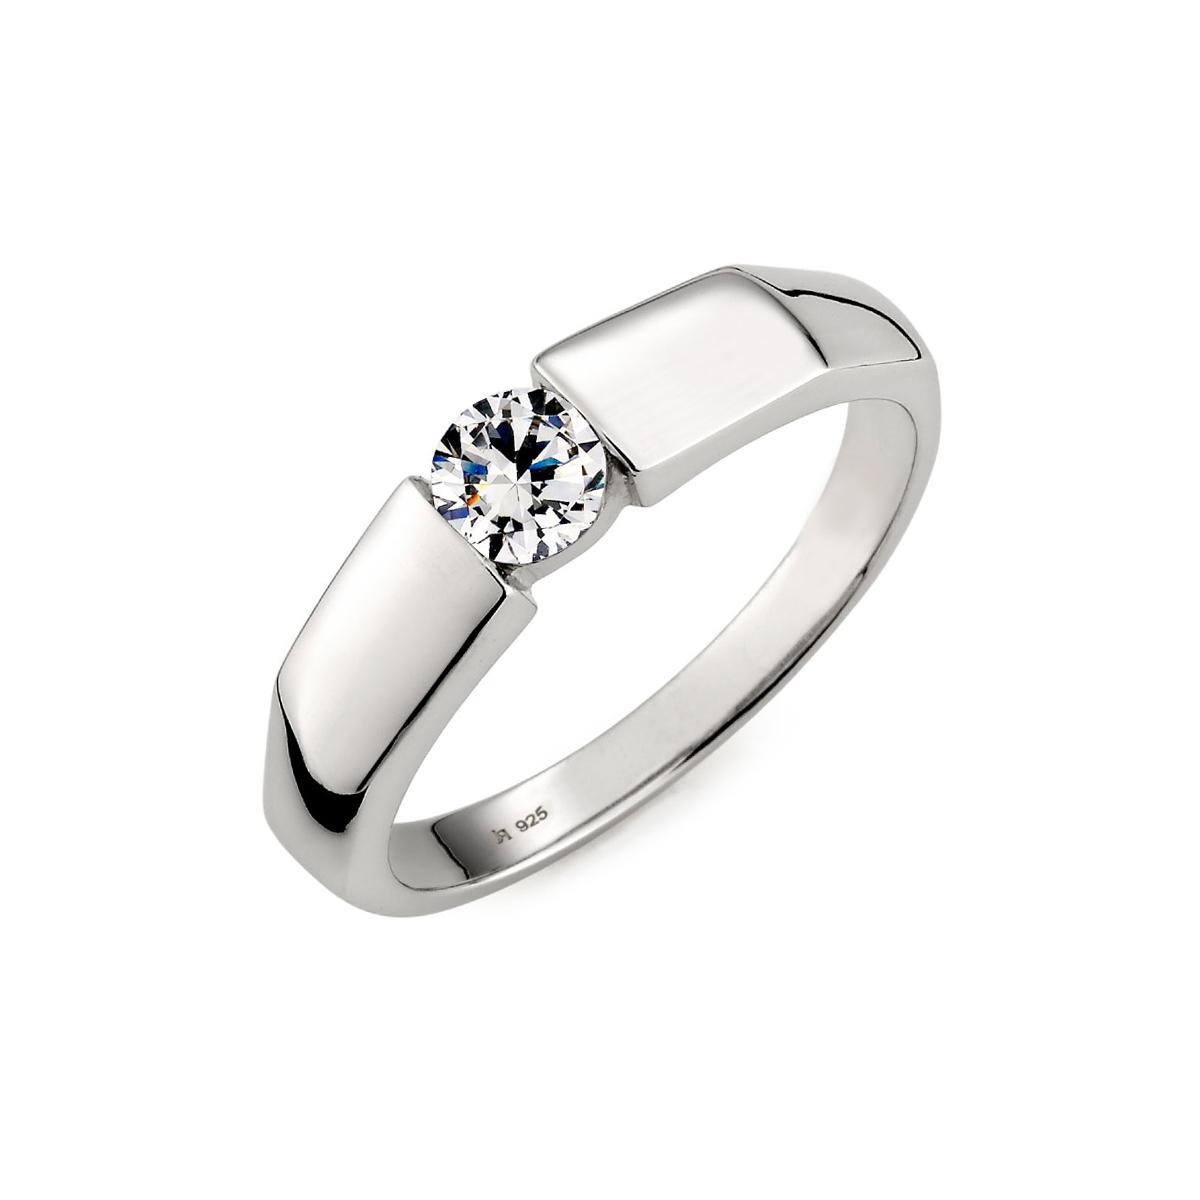 KSM68 最初的夢想切面厚實戒指